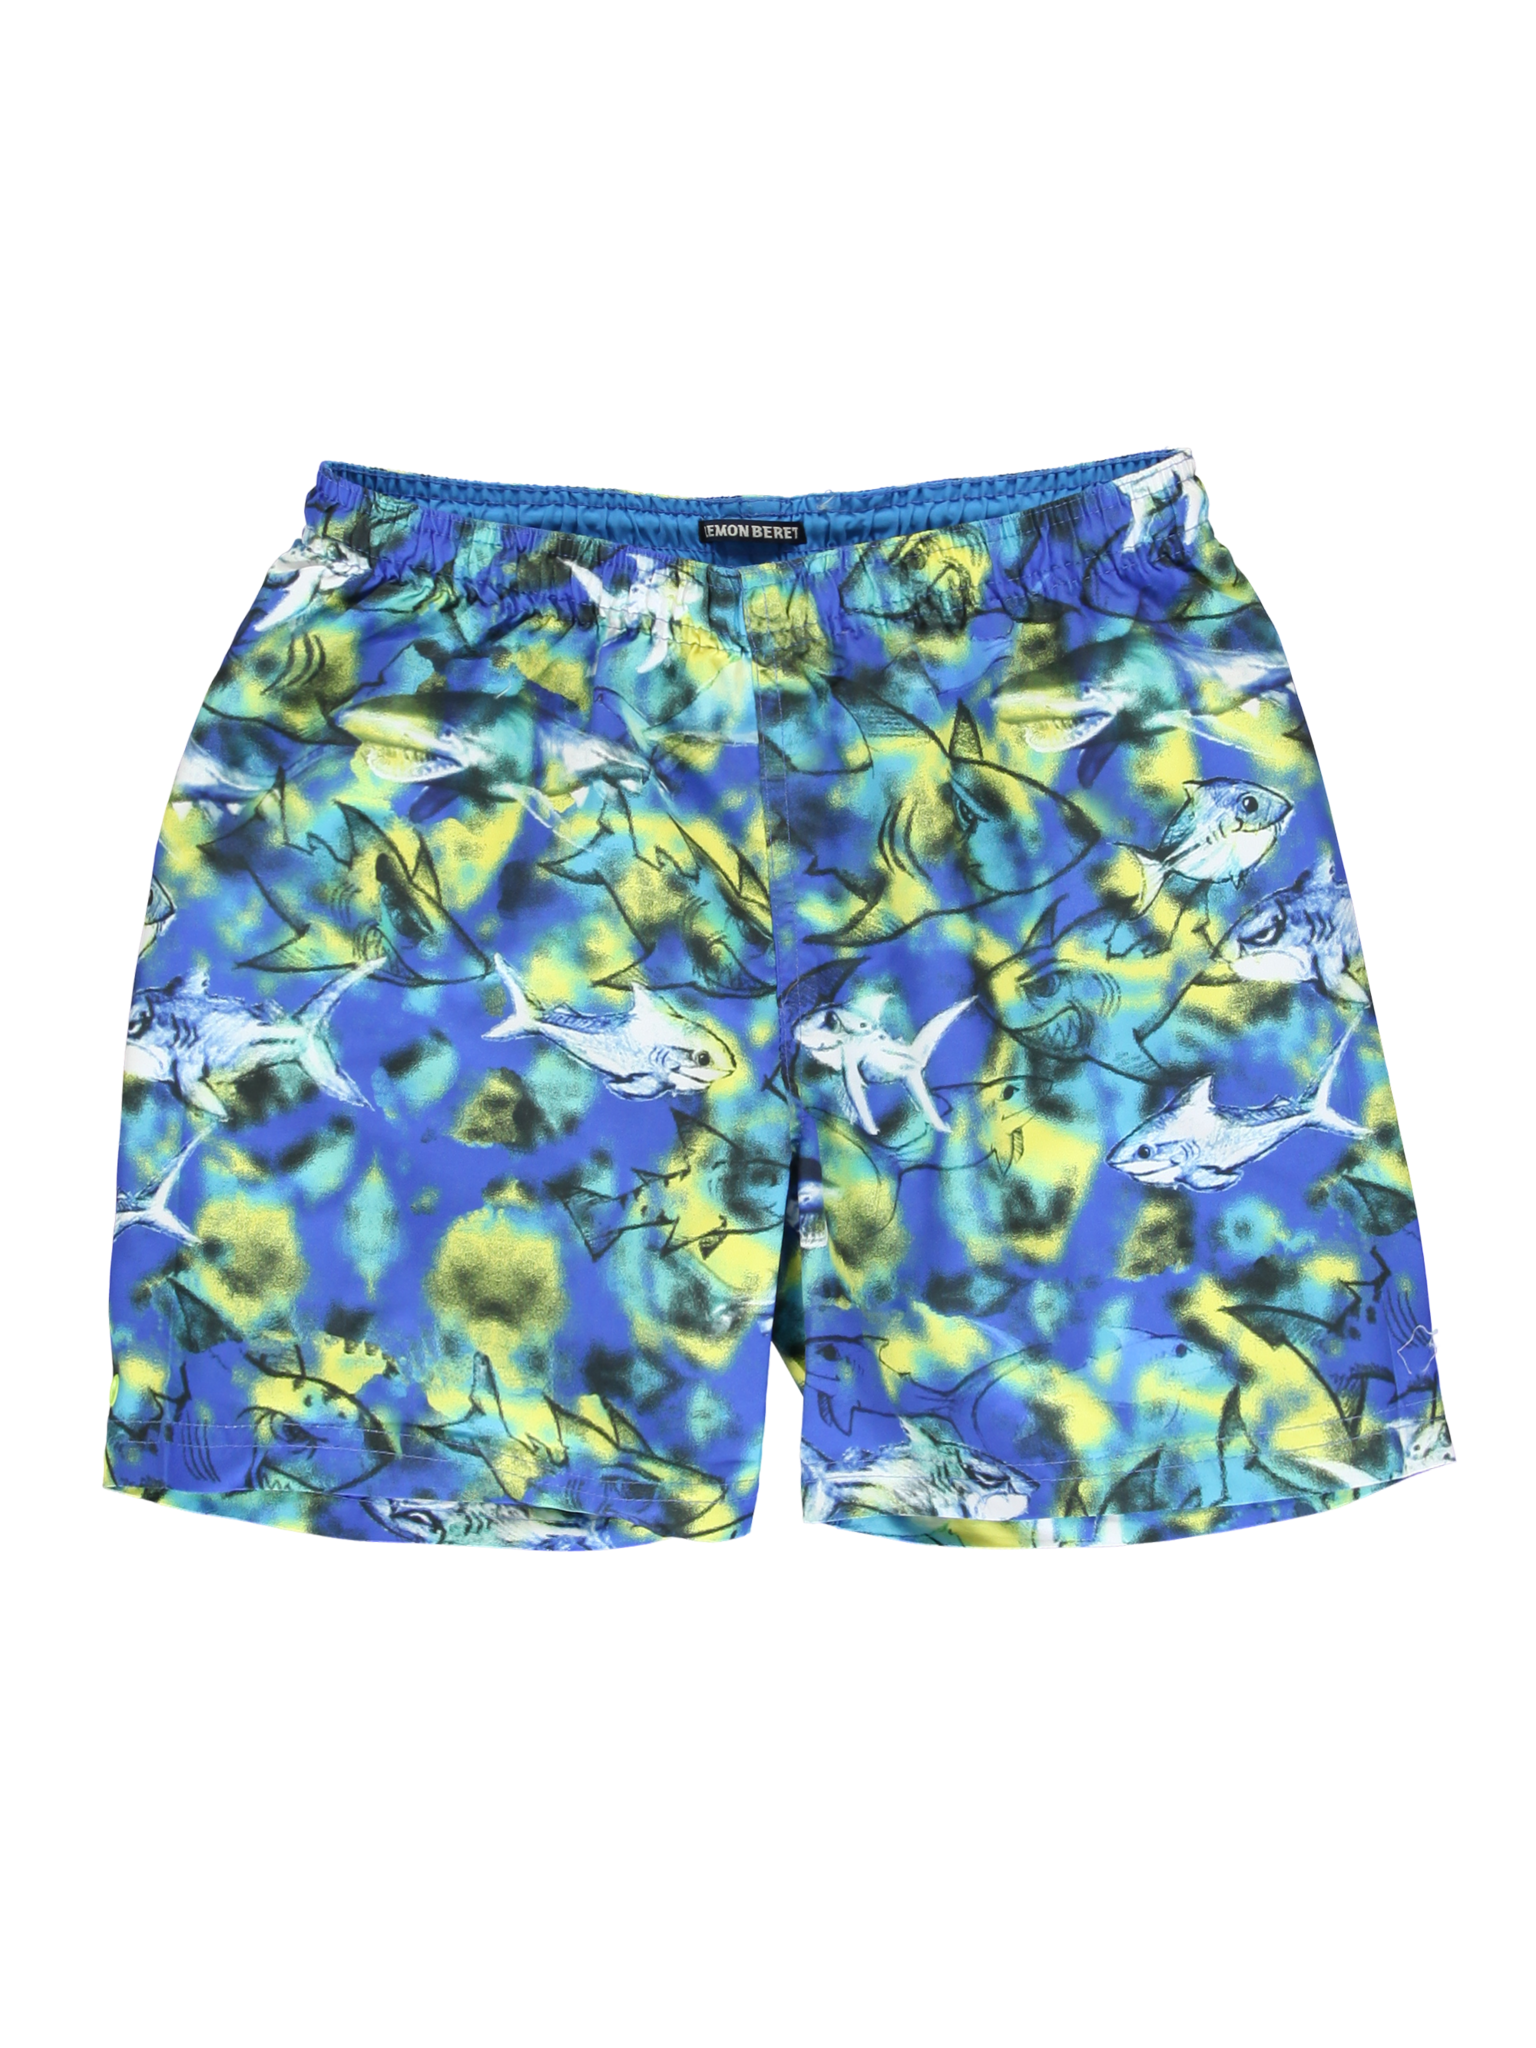 All Brands | Summerproducts Teen Boys | Swimwear | 12 pcs/box